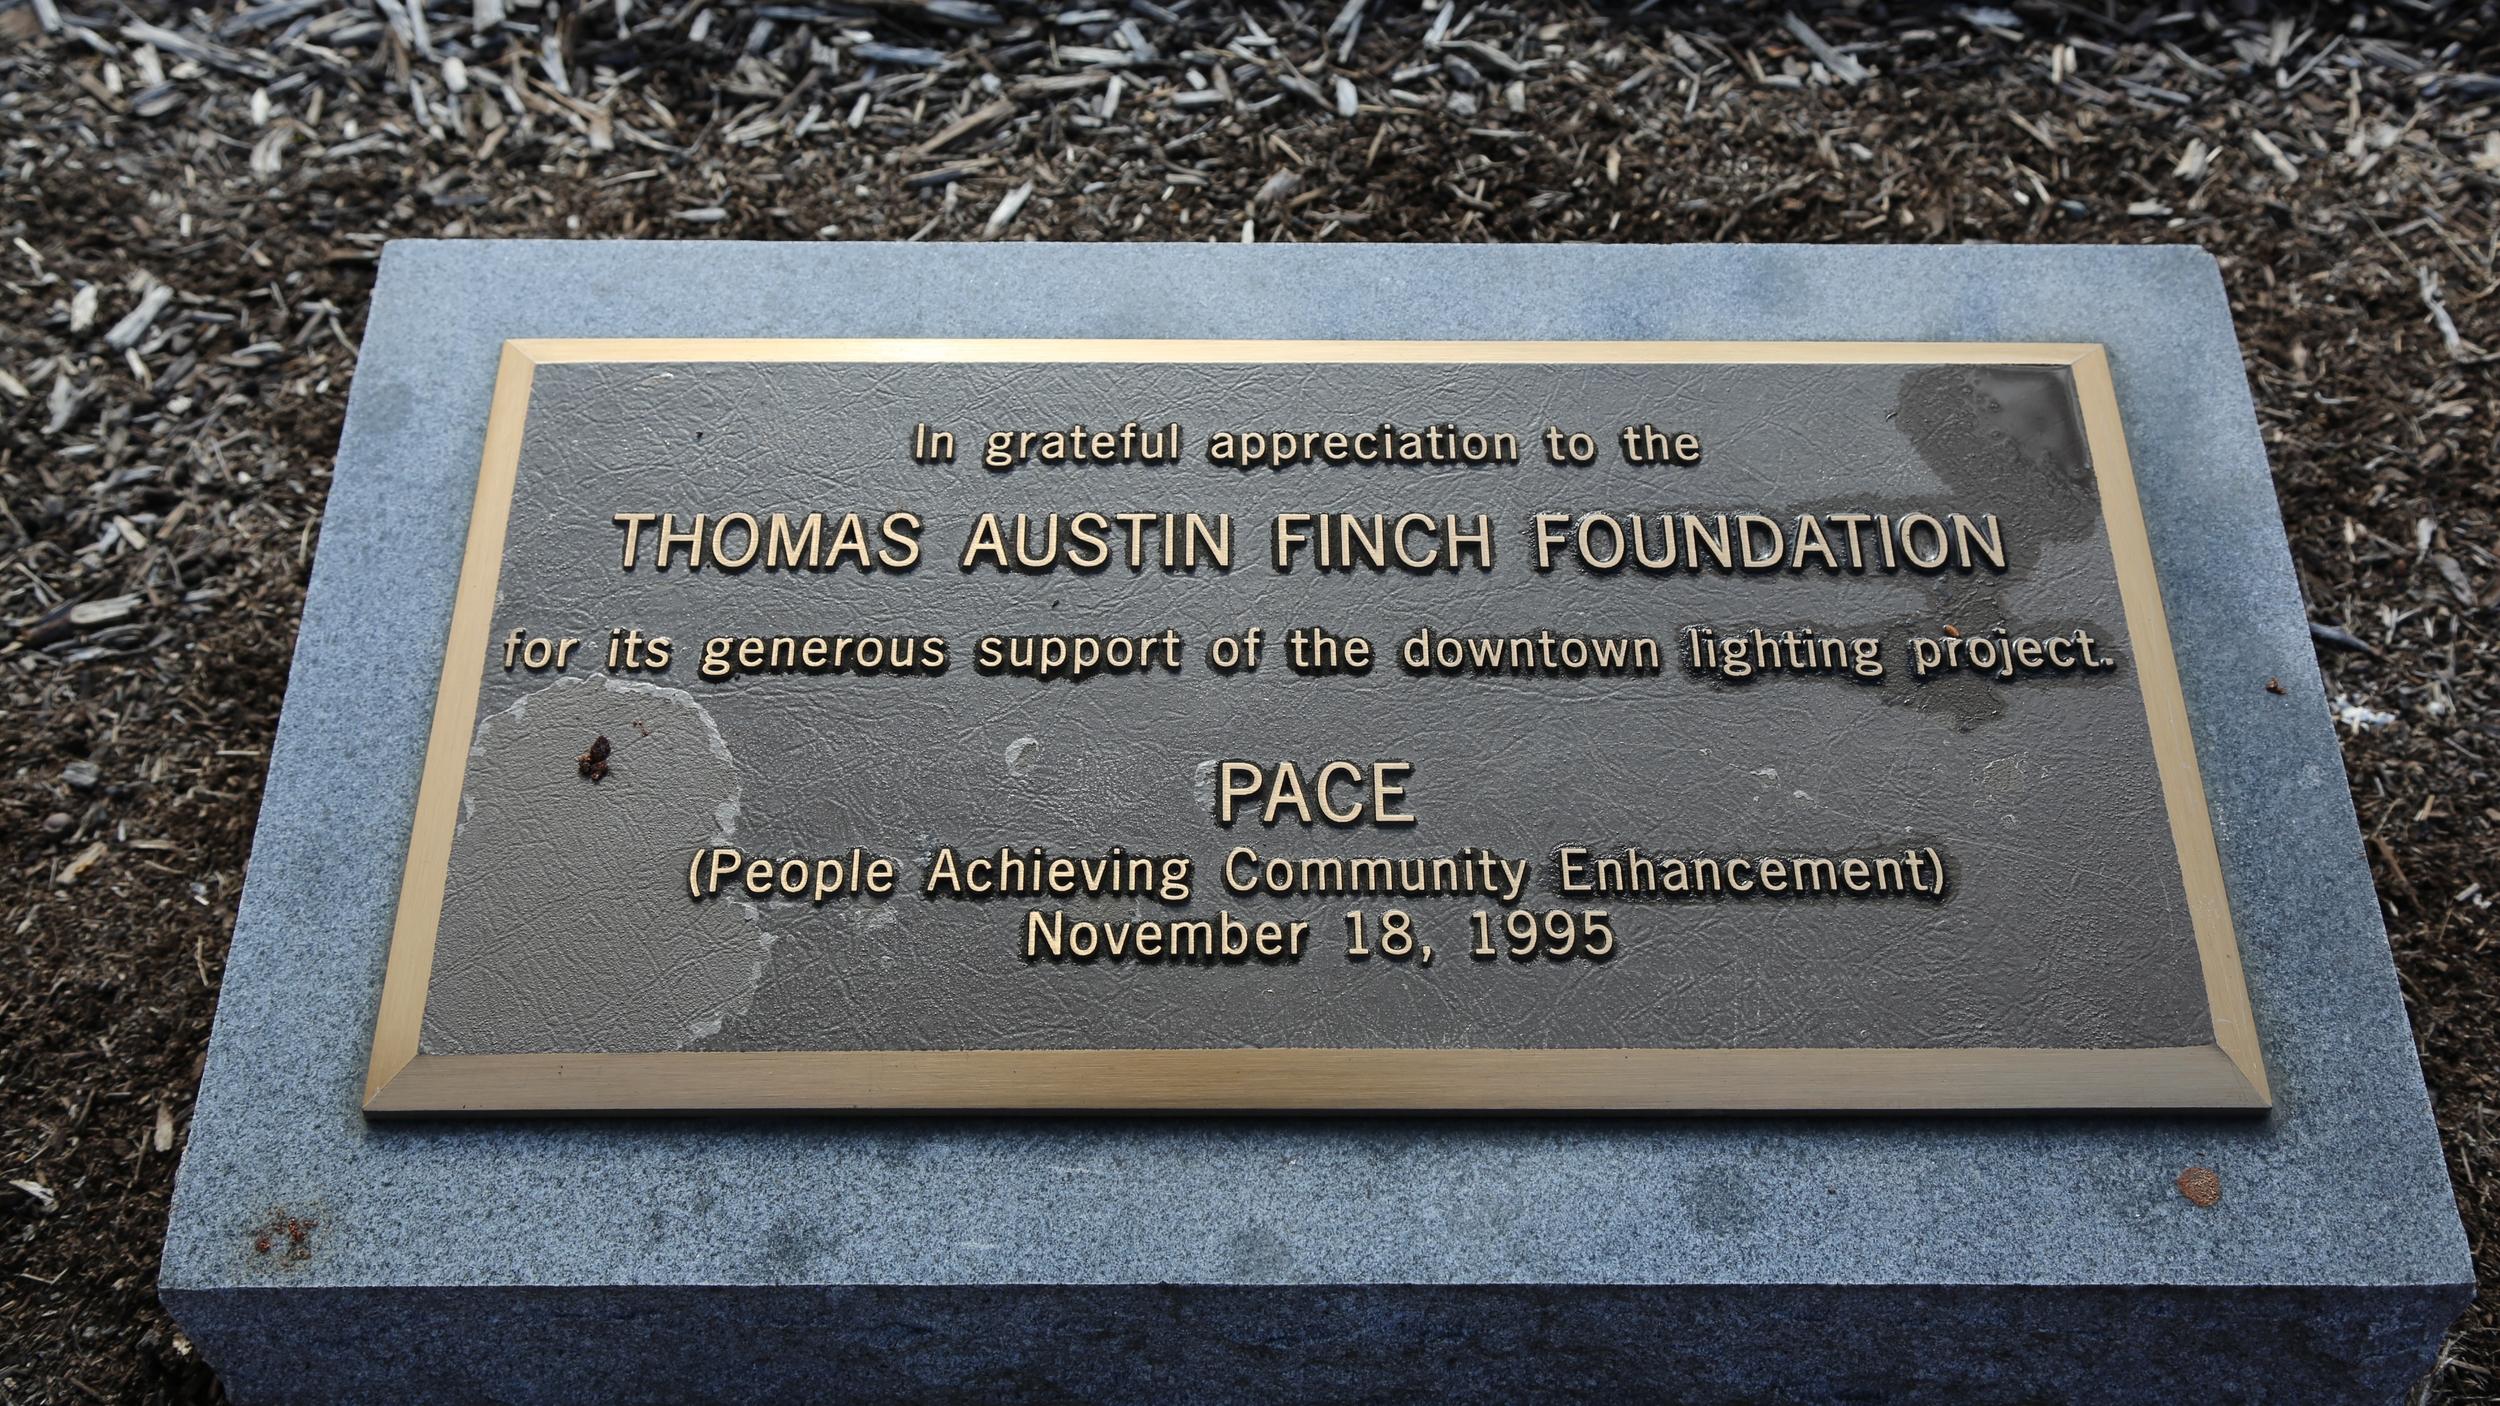 T.A. Finch Foundation honorarium